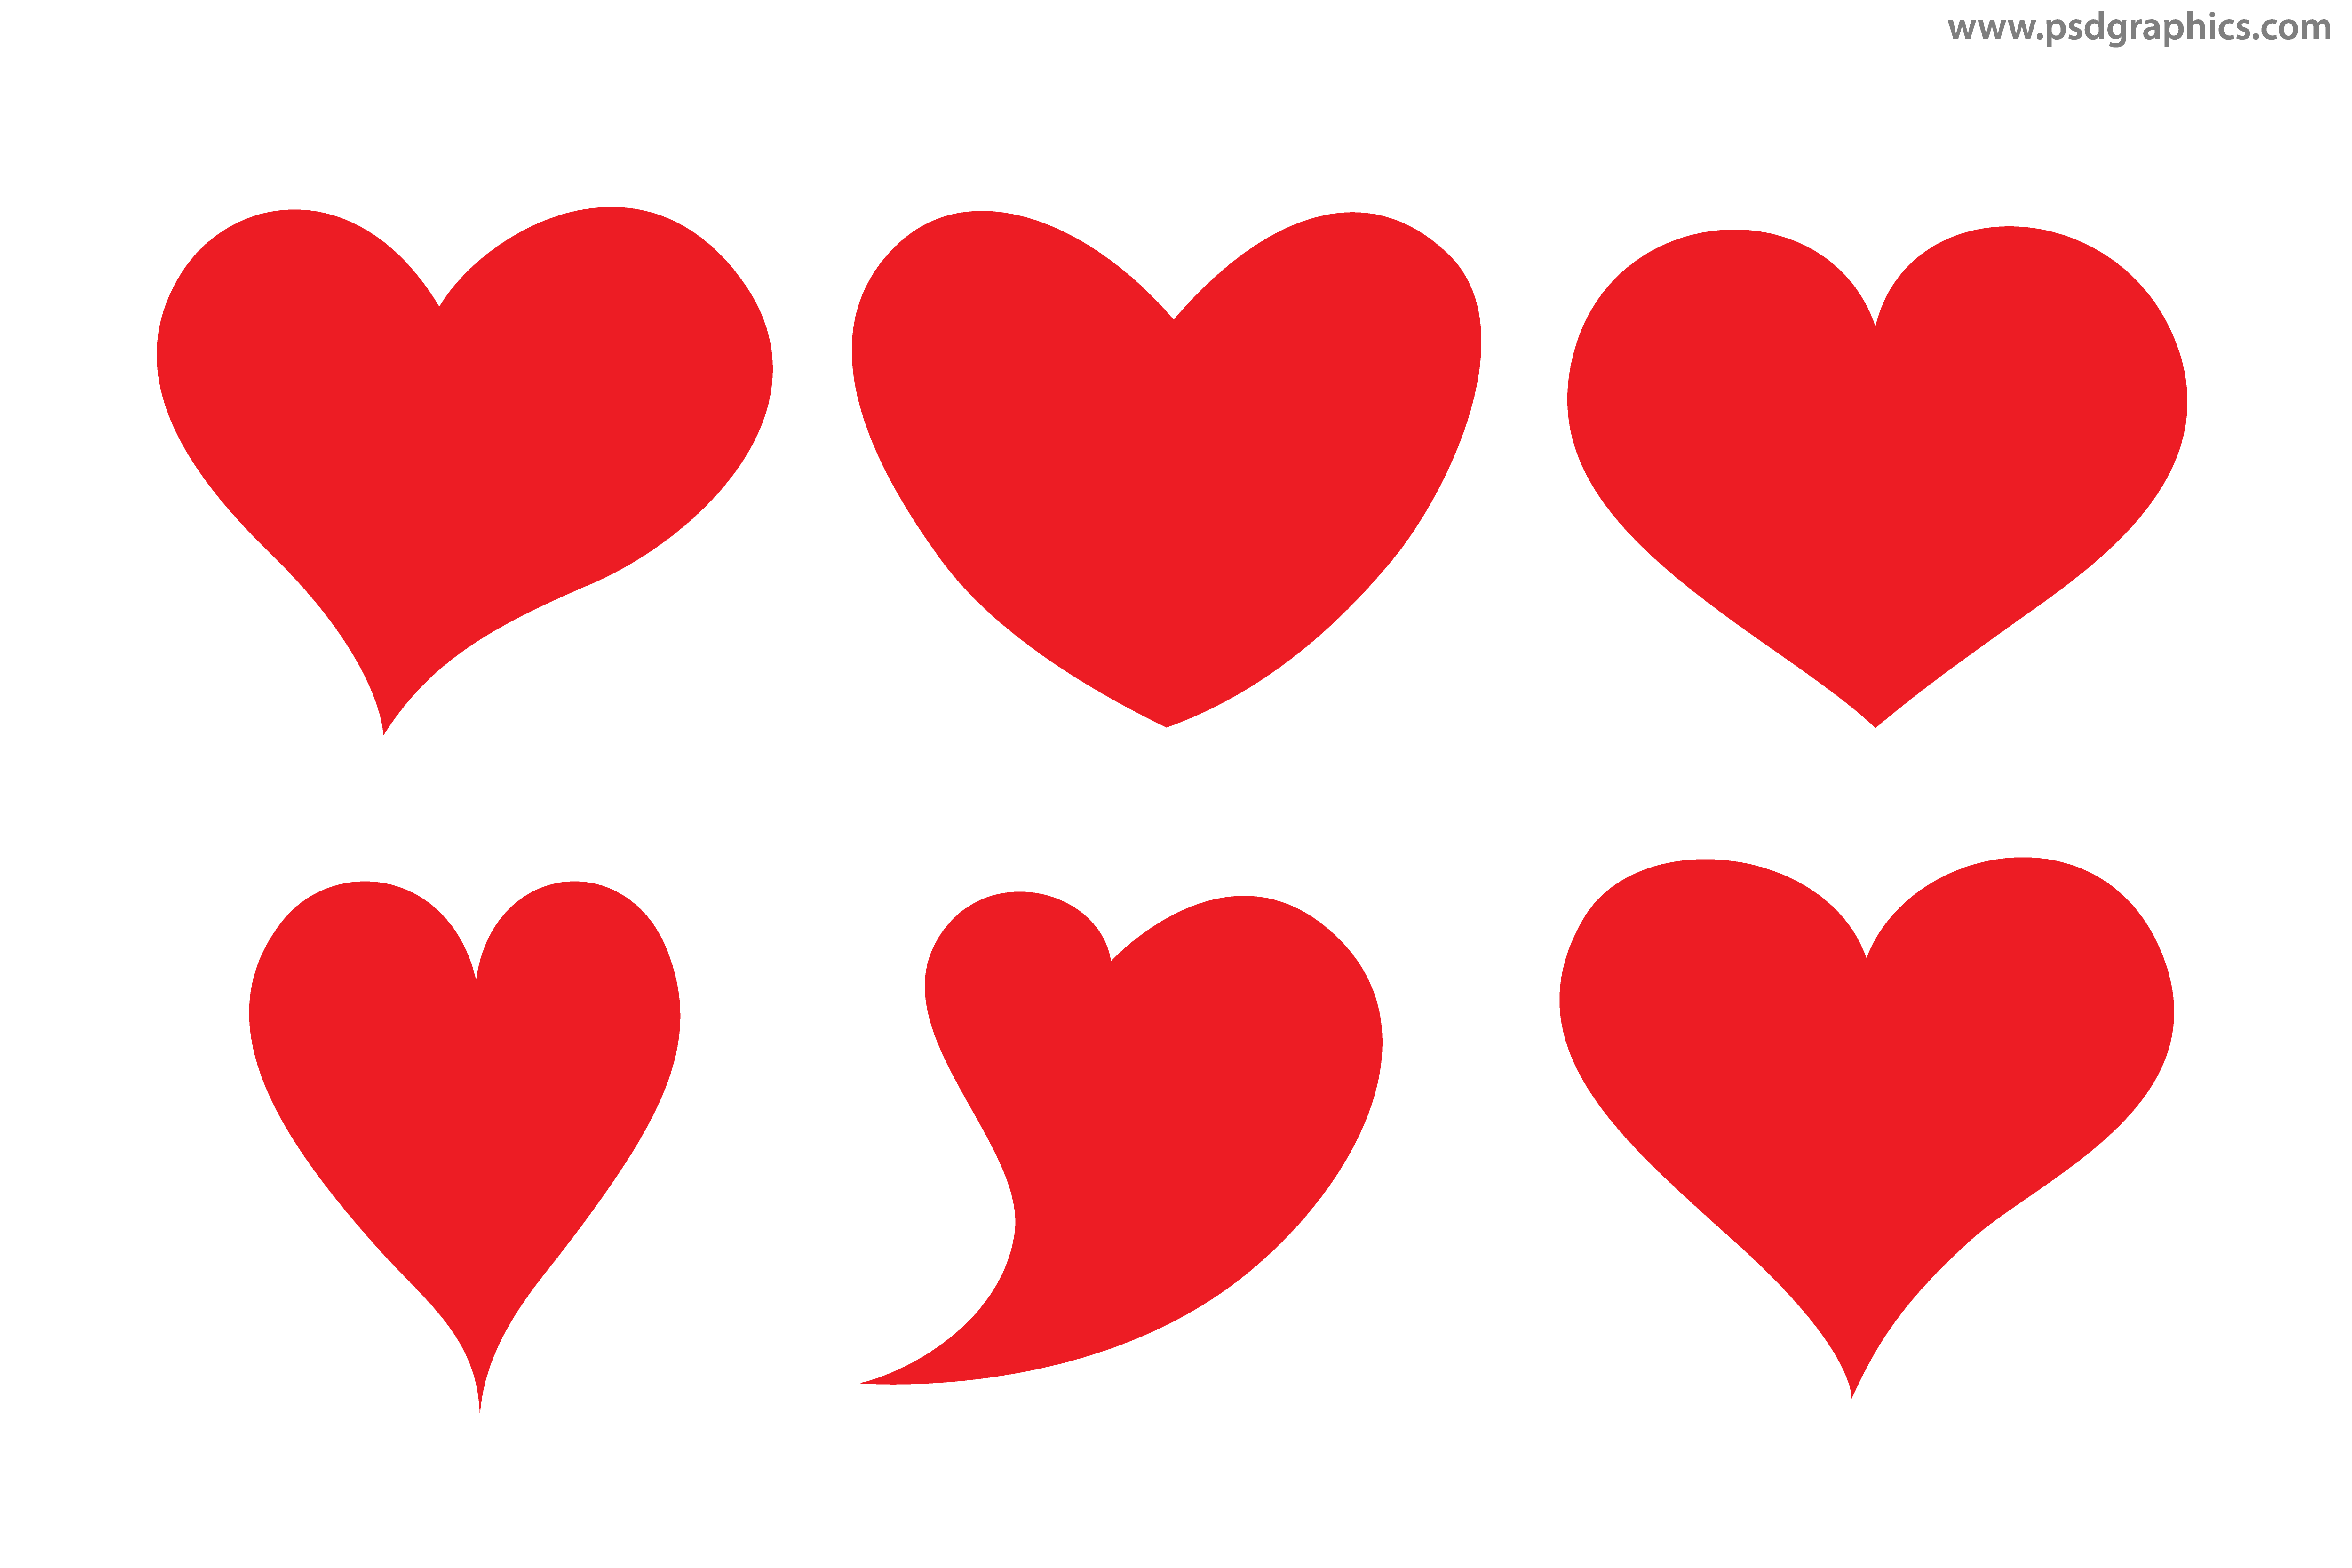 vector hearts shapes psdgraphics rh psdgraphics com vector heart art vector heartworm